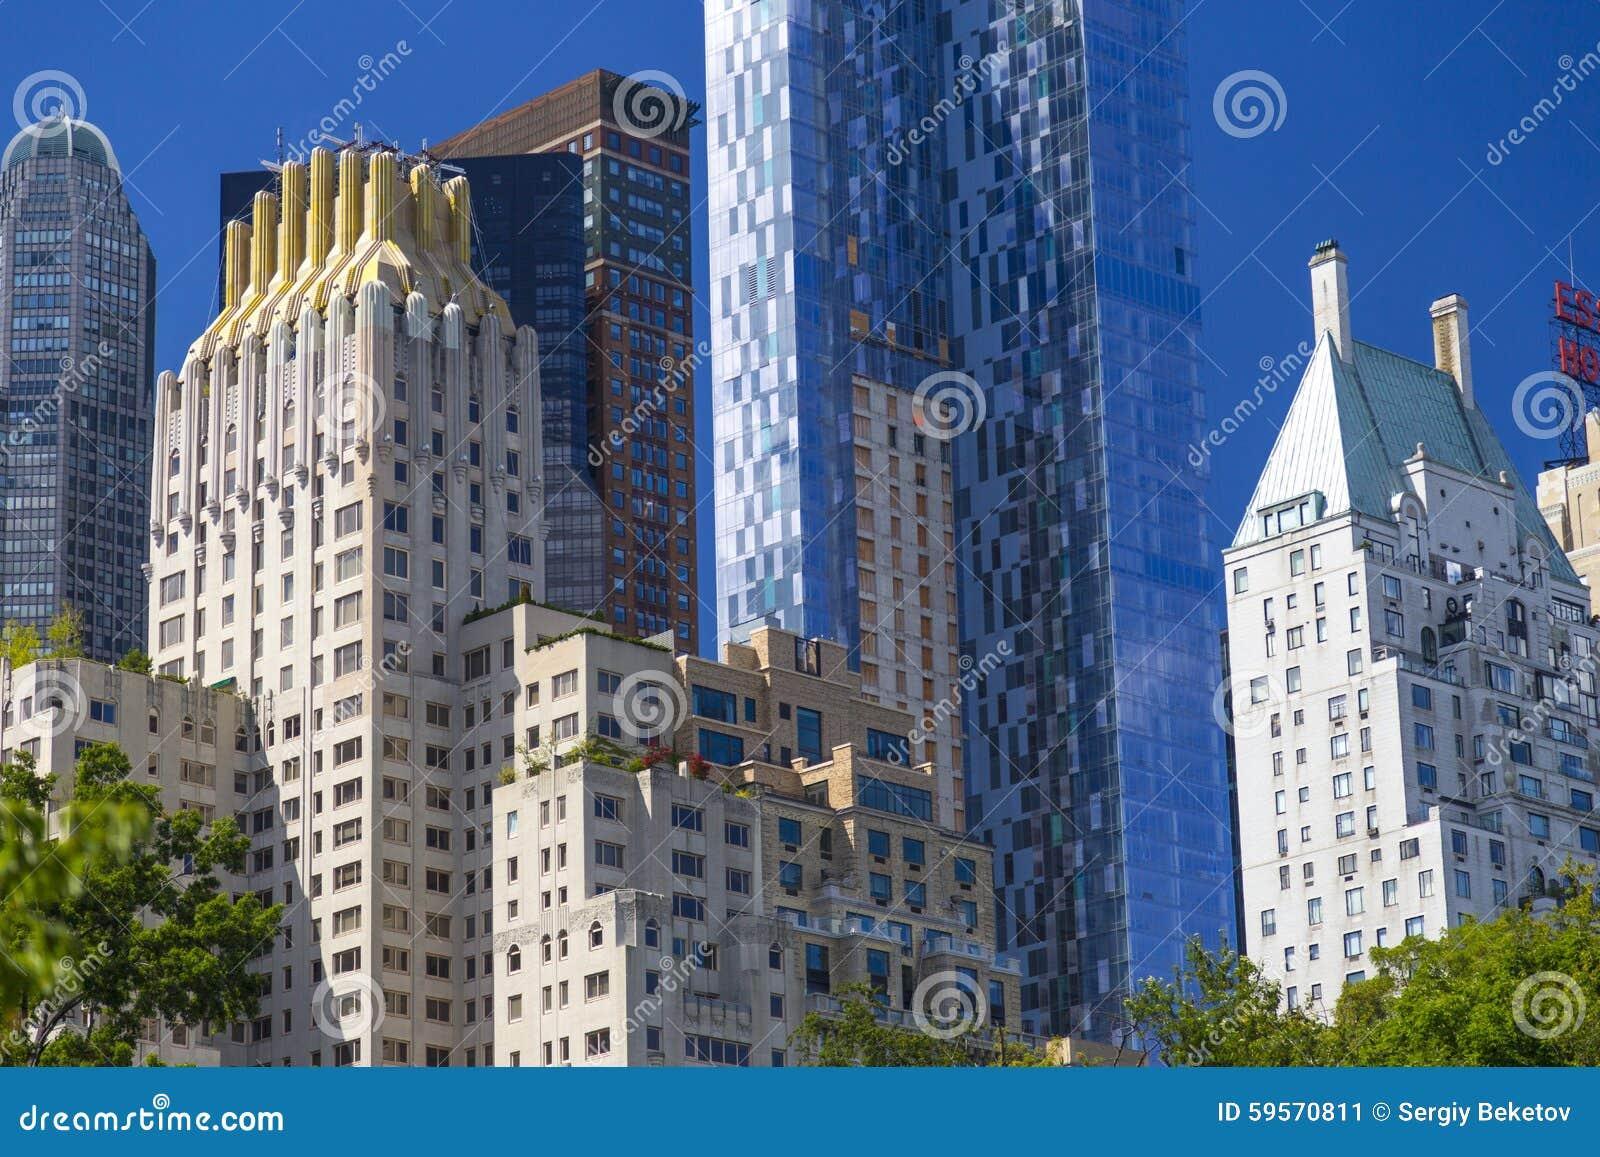 THE 10 BEST Hotels in New York City, NY for  - TripAdvisor